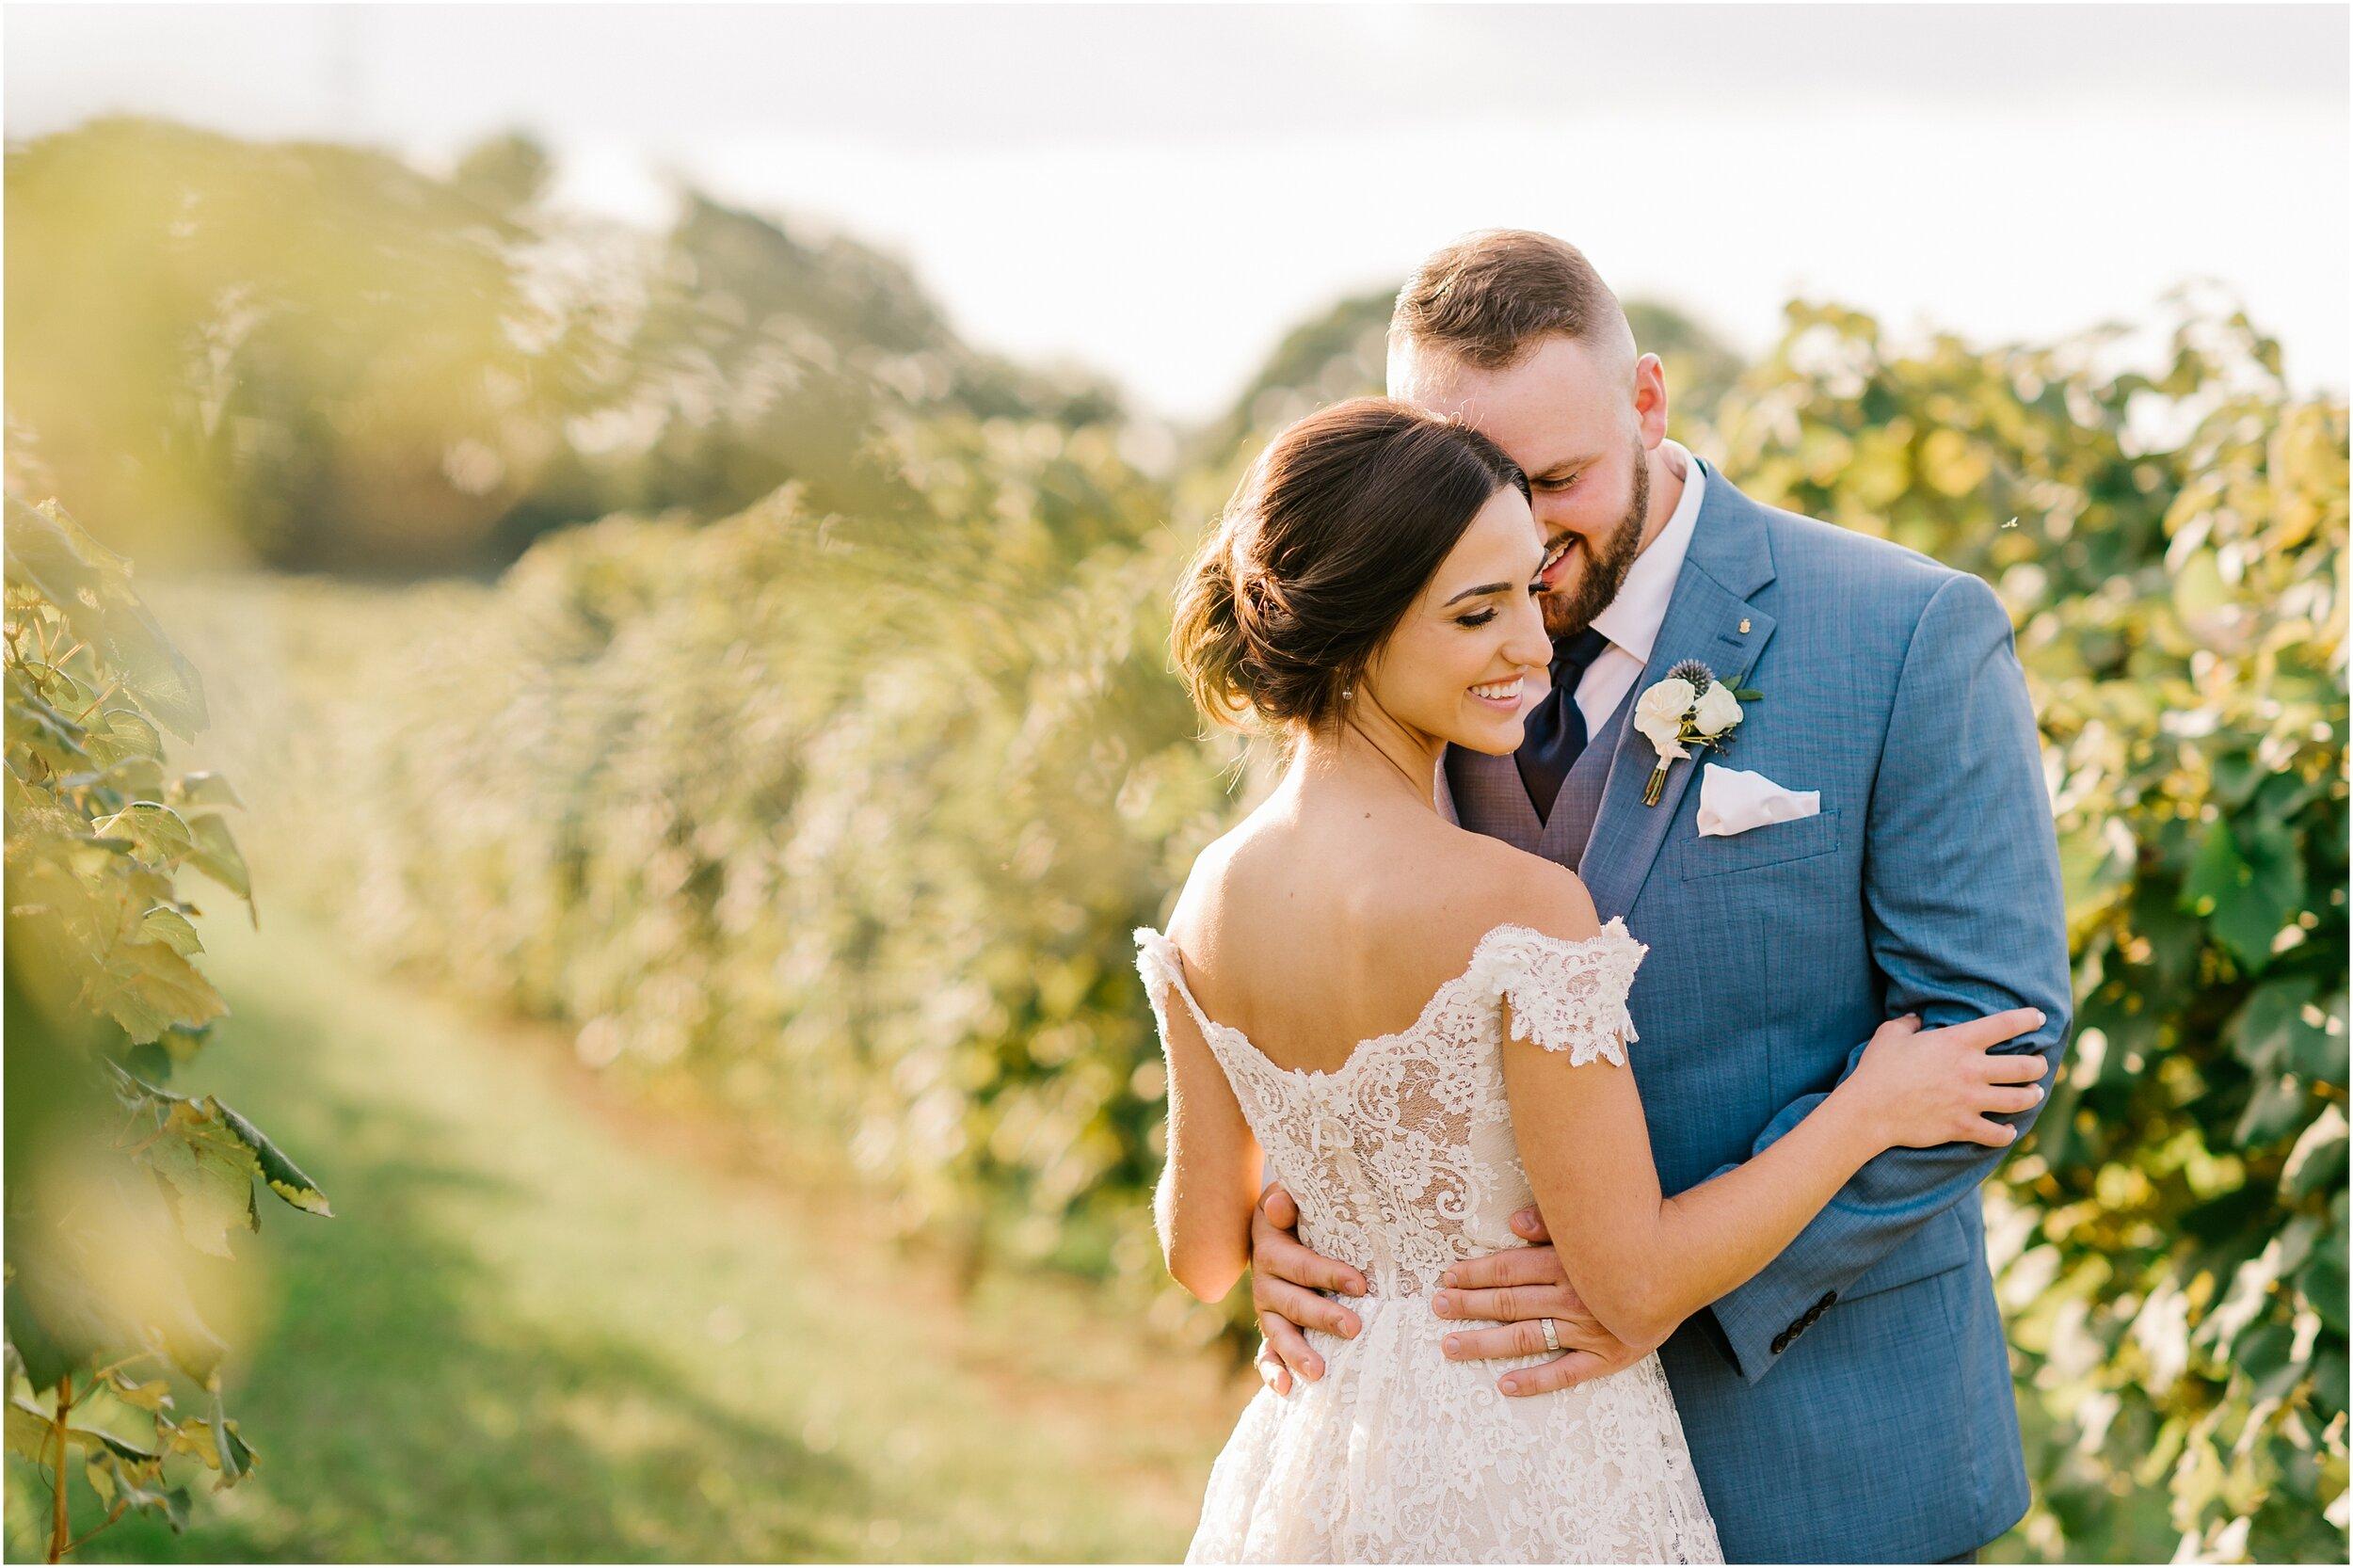 Rebecca Shehorn Photography Indianapolis Wedding Photographer Sycamore at Mallow Run_0766.jpg